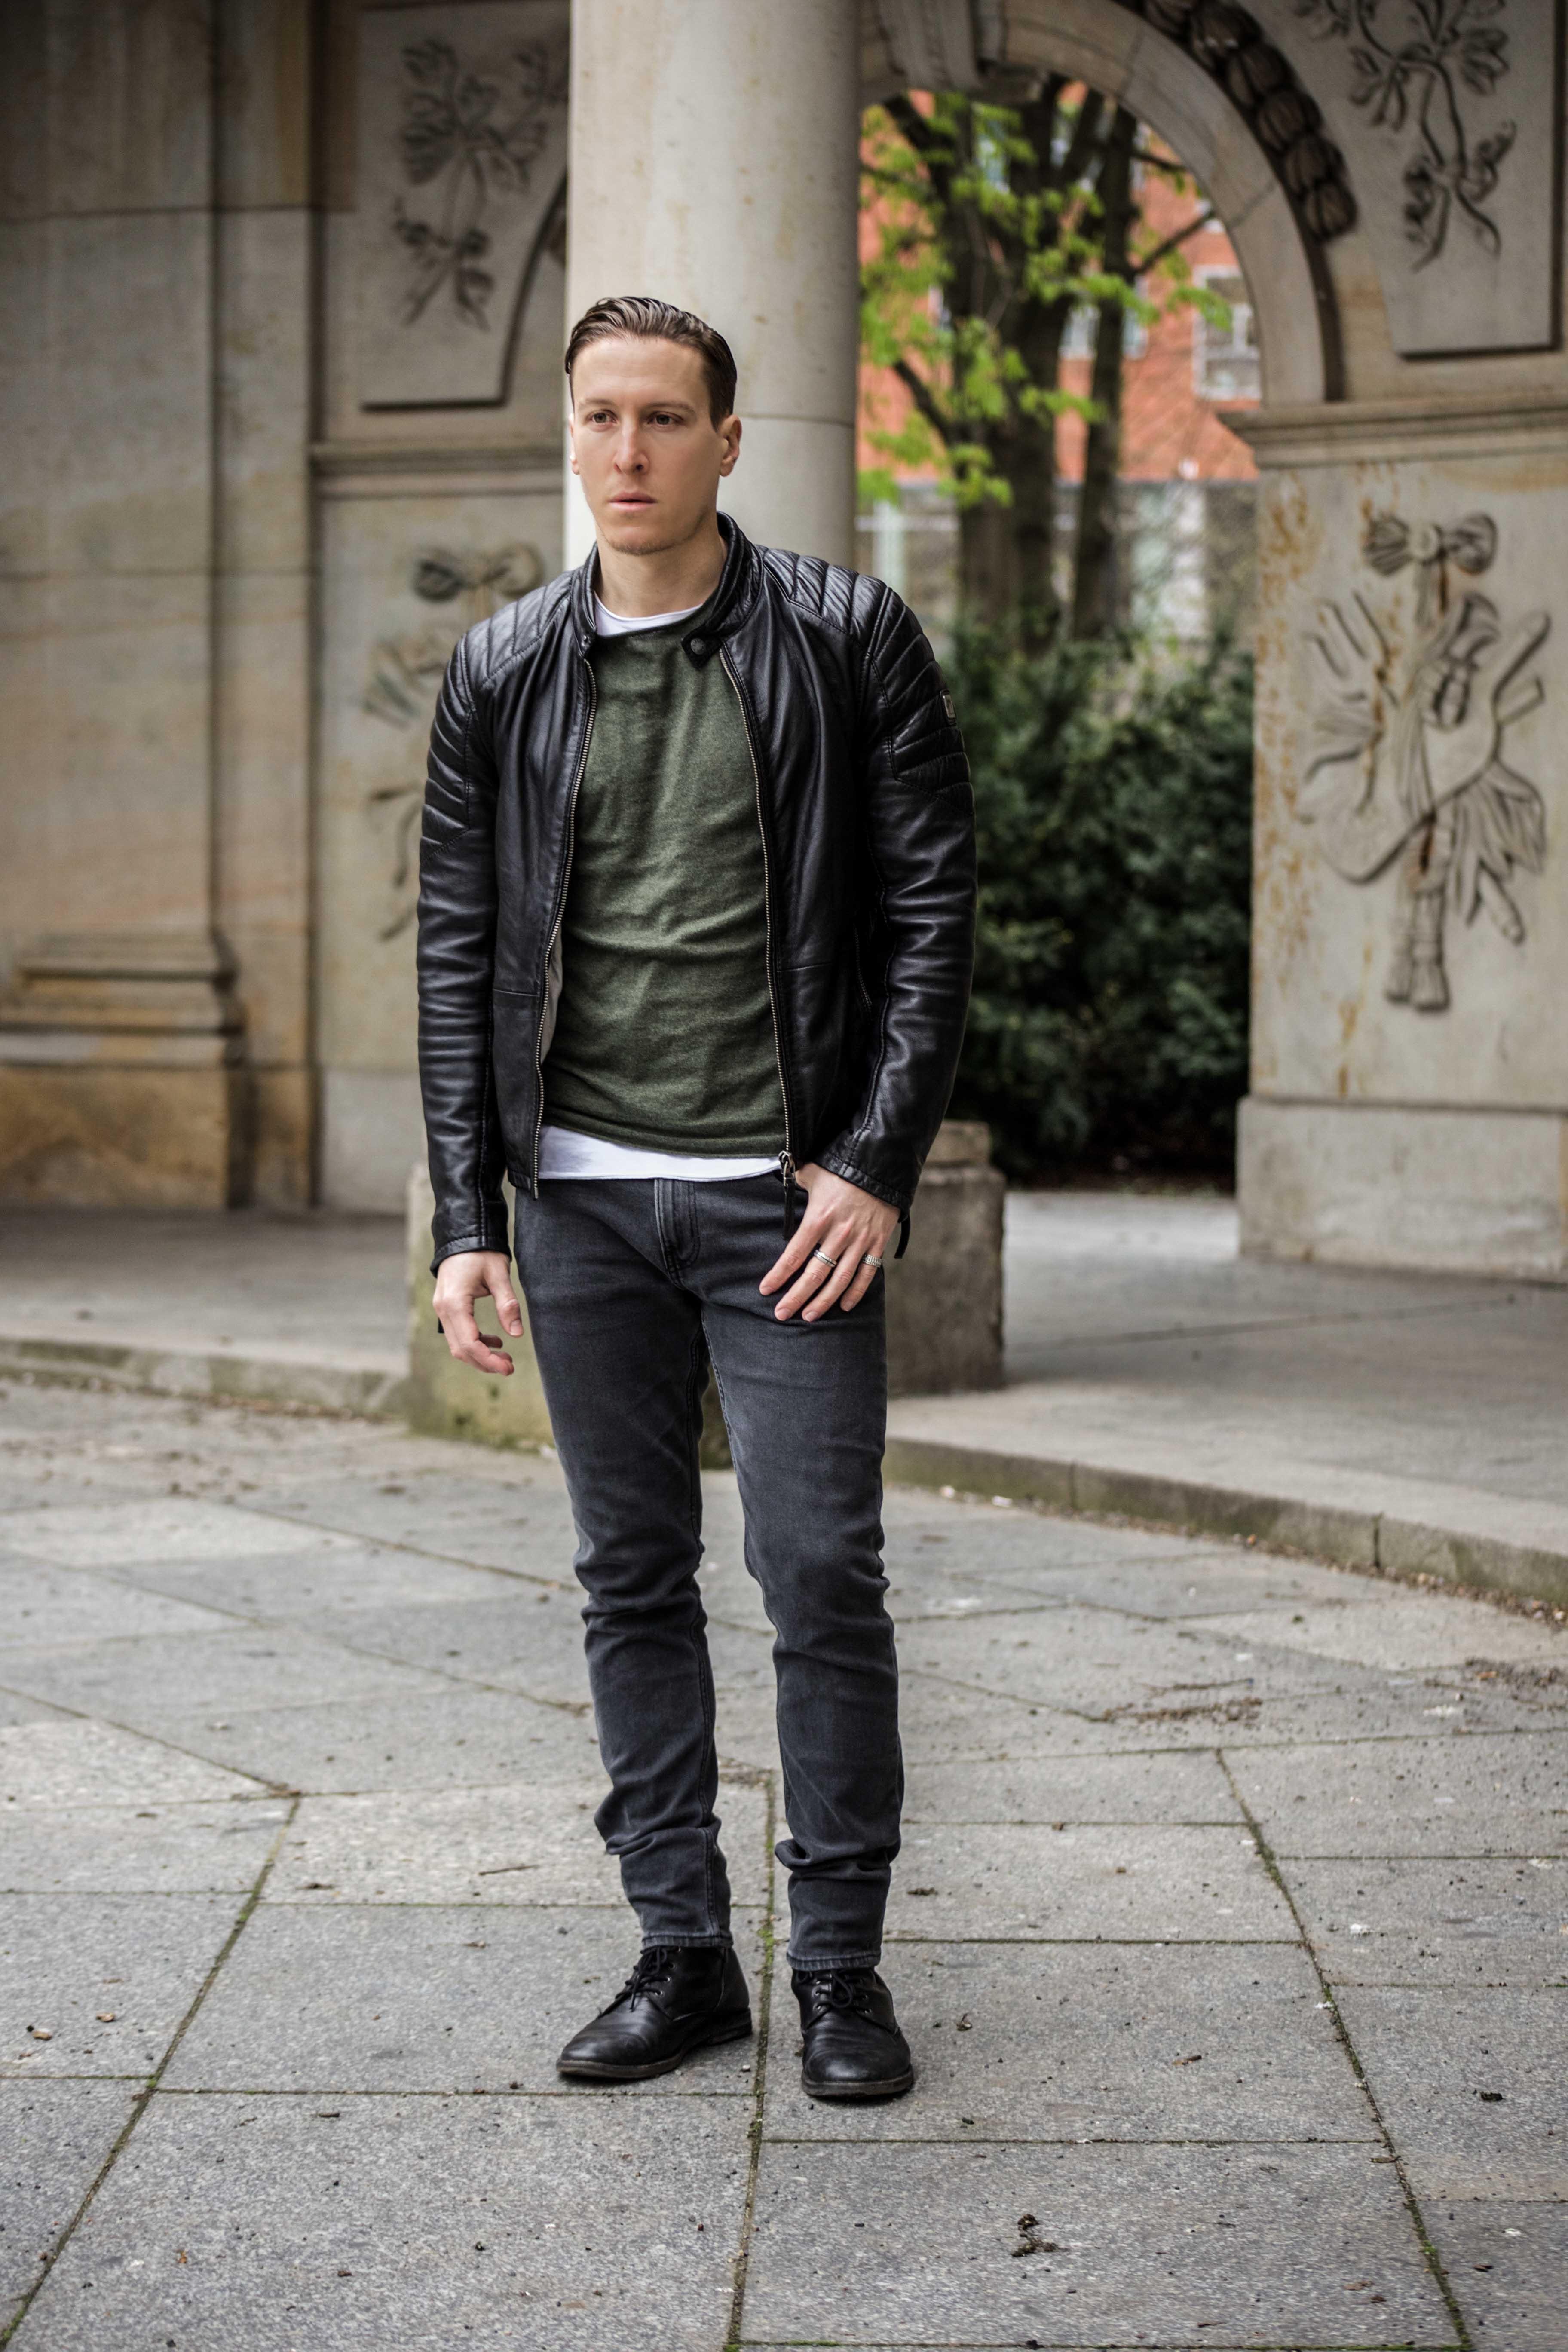 lederjacke-gipsy-frühlingslook-fashion-modeblog-grünes-sweatshirt_6105